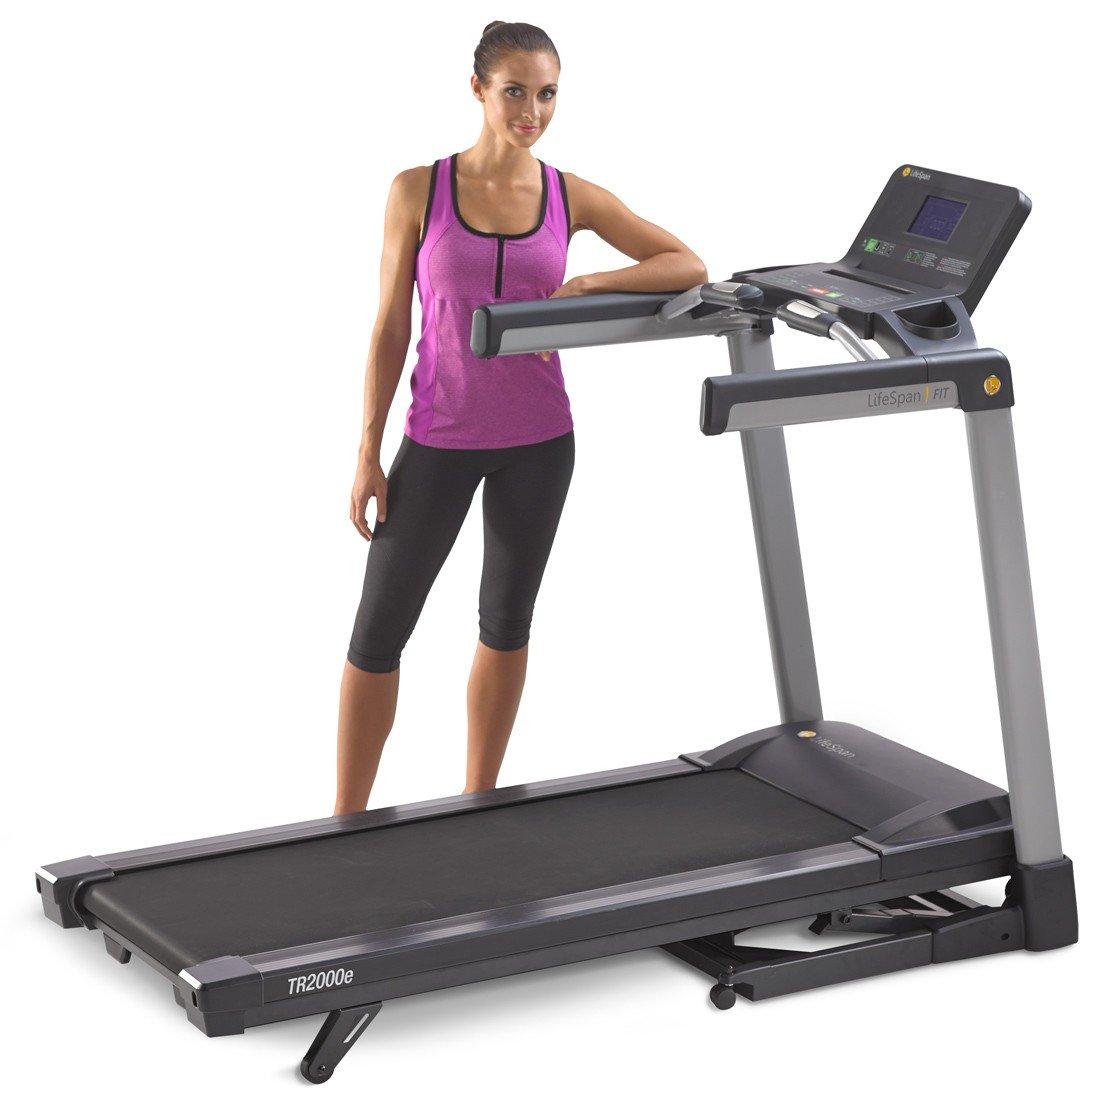 Lifespan TR2000e Folding Treadmill